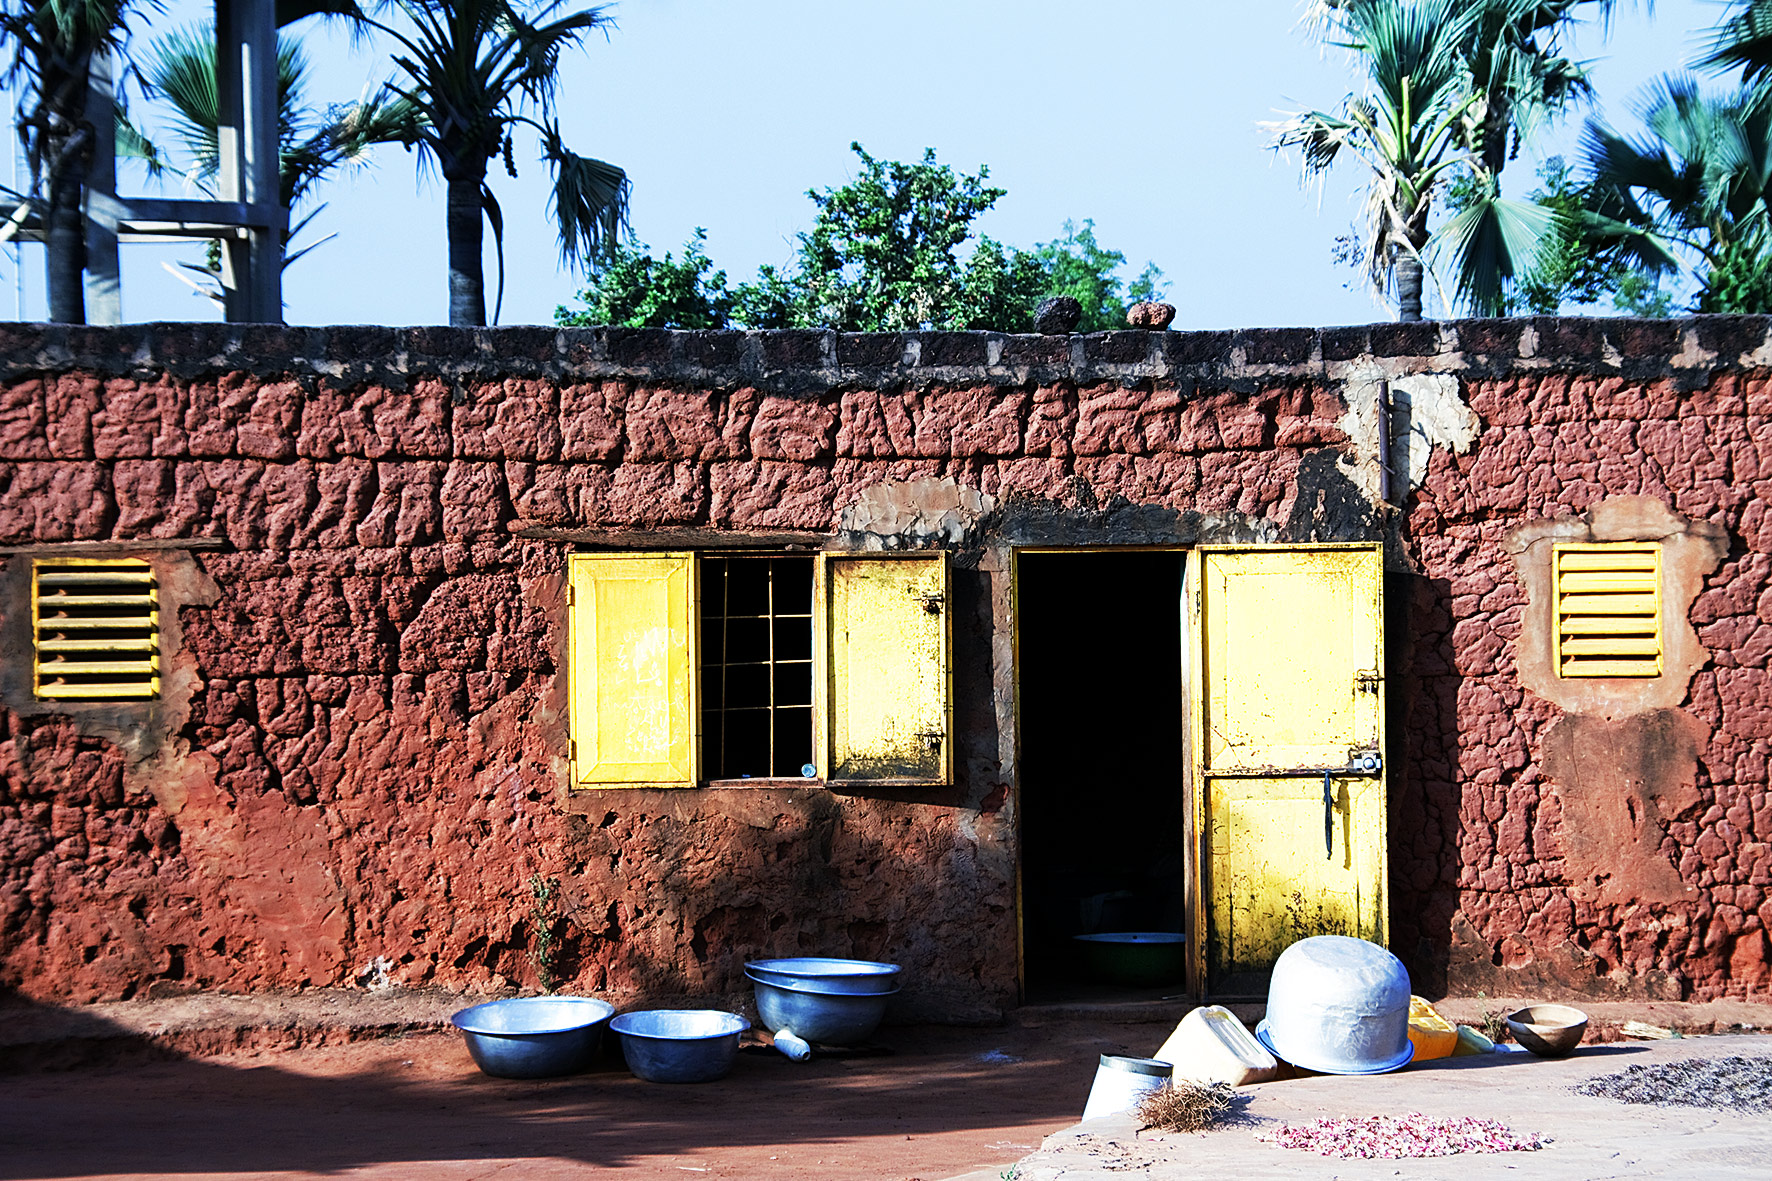 #Afrique 21. Burkina Faso, Bobo-Dioulasso. 2010